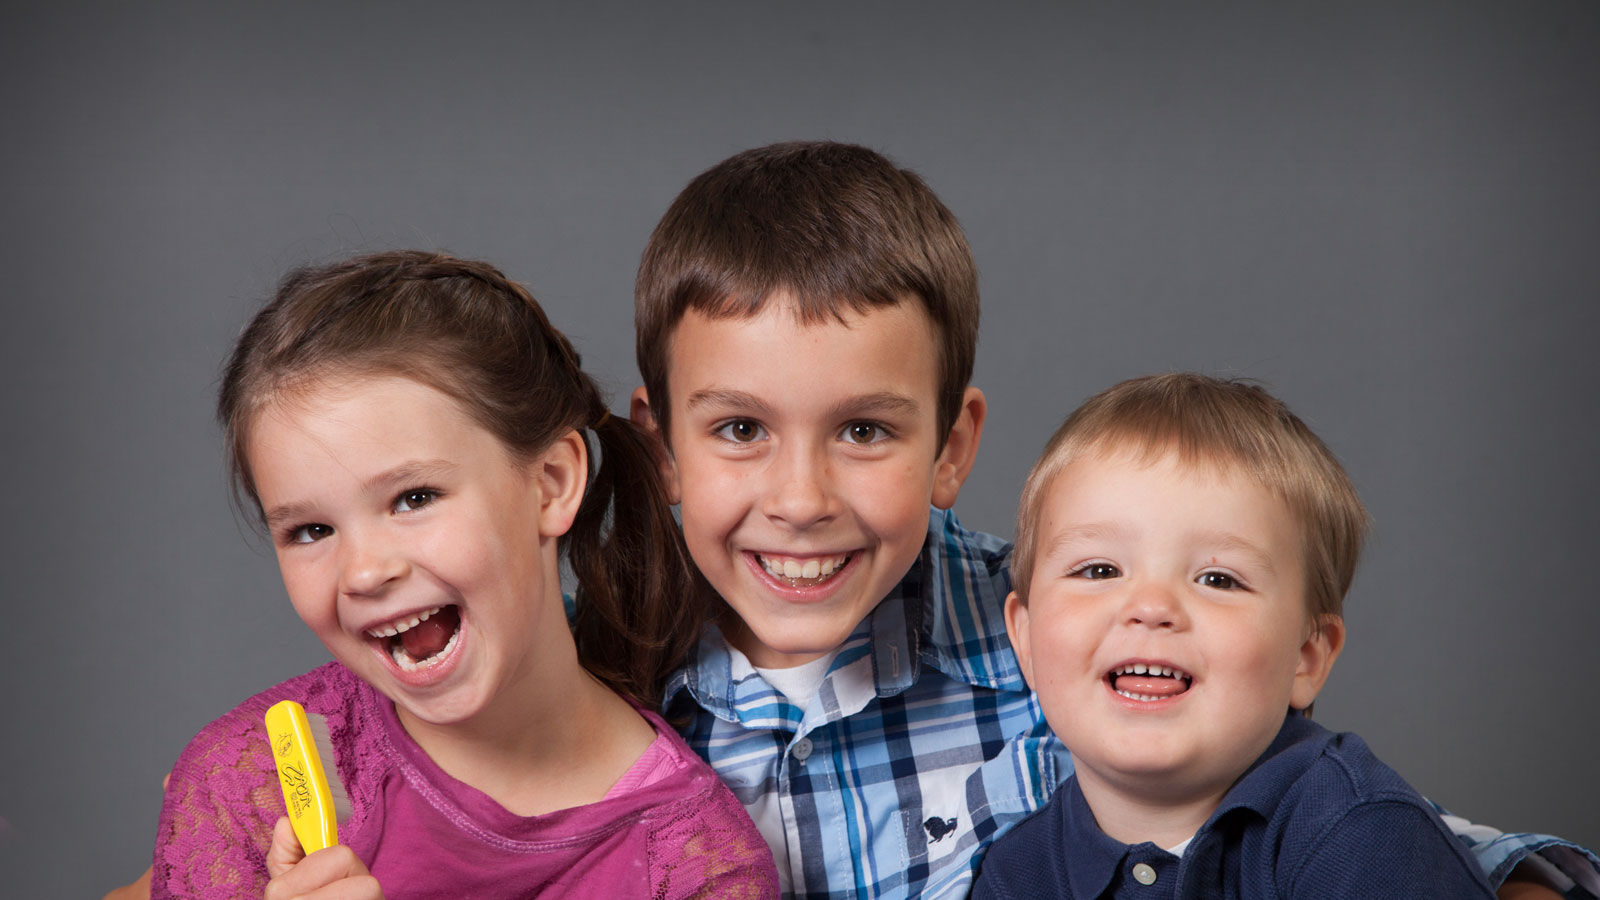 Pediatric Dentist Nashville TN, Child Dentist   Adams & Seaton